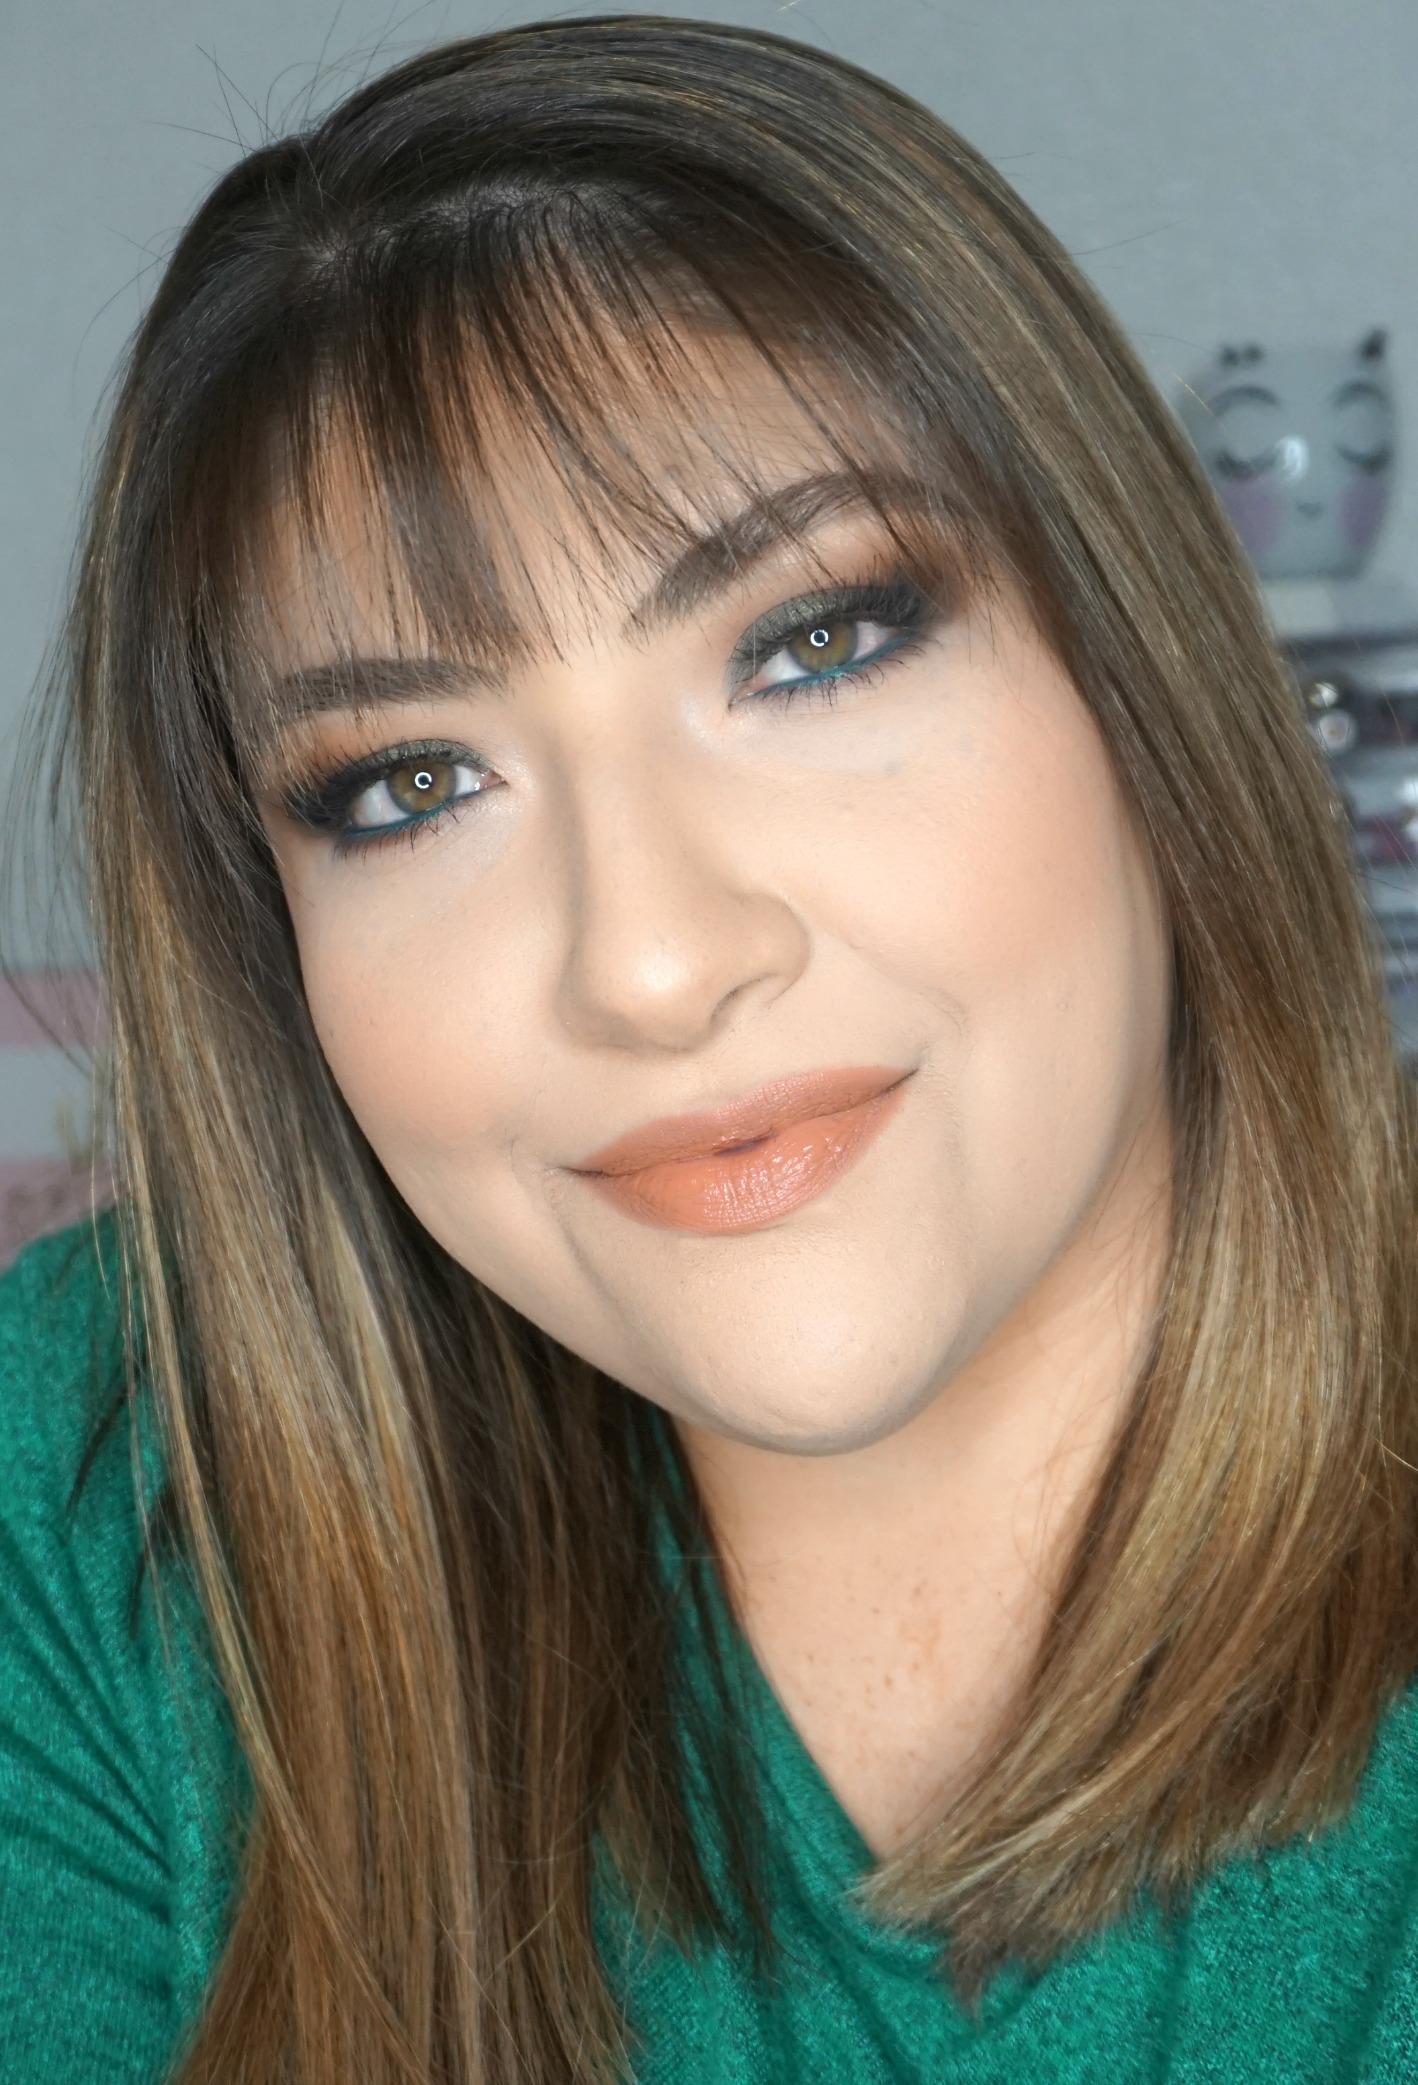 Olive Eye Look // Fall Makeup Look // Nude Lips // Smokey Eye // Easy Makeup | Beauty With Lily